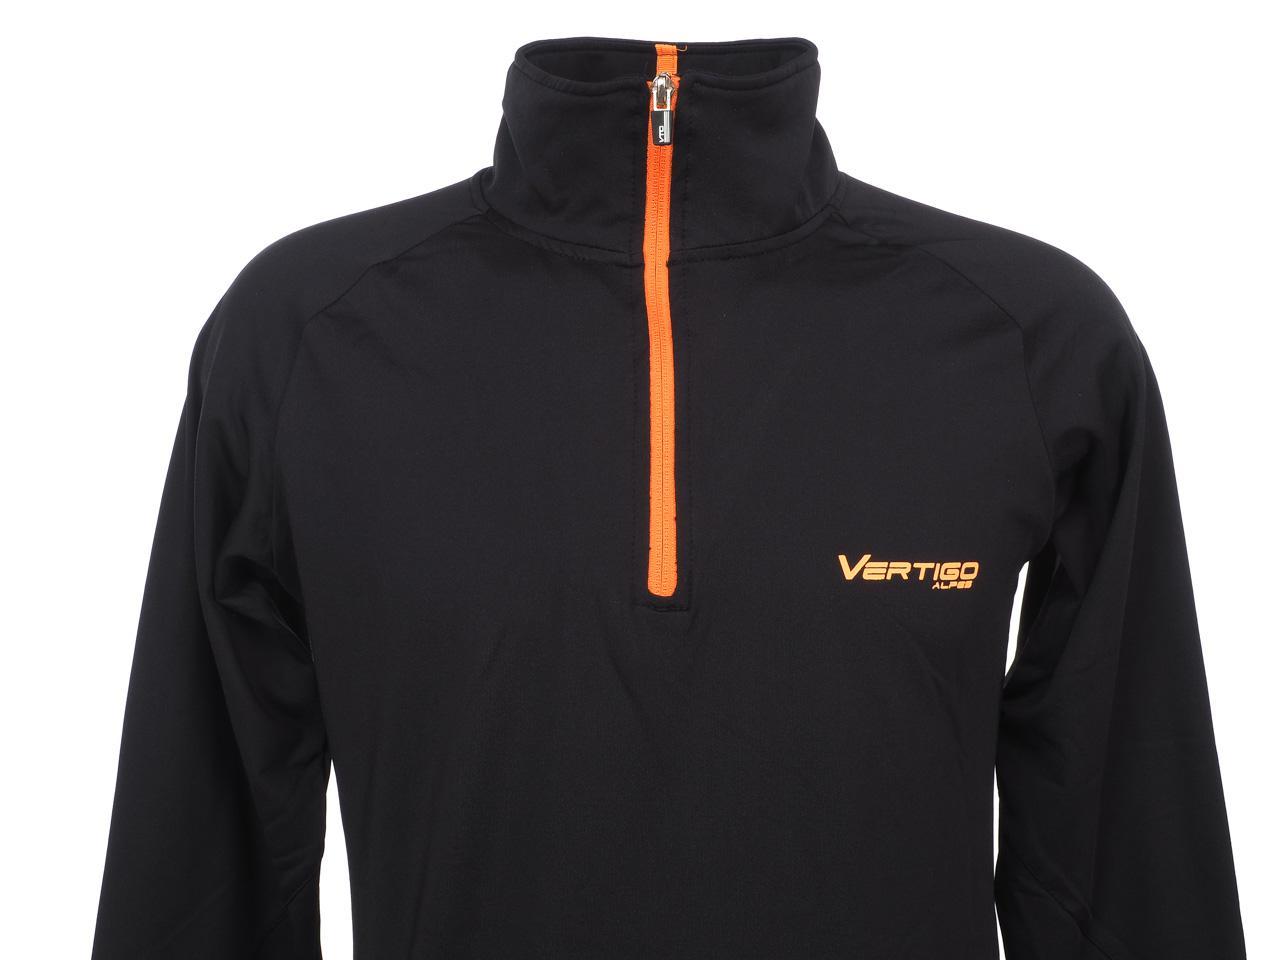 Under-Clothing-Thermal-Hot-Alpes-Vertigo-Manu-Blk-1-2z-ML-Tee-Poly-Black-251 thumbnail 2